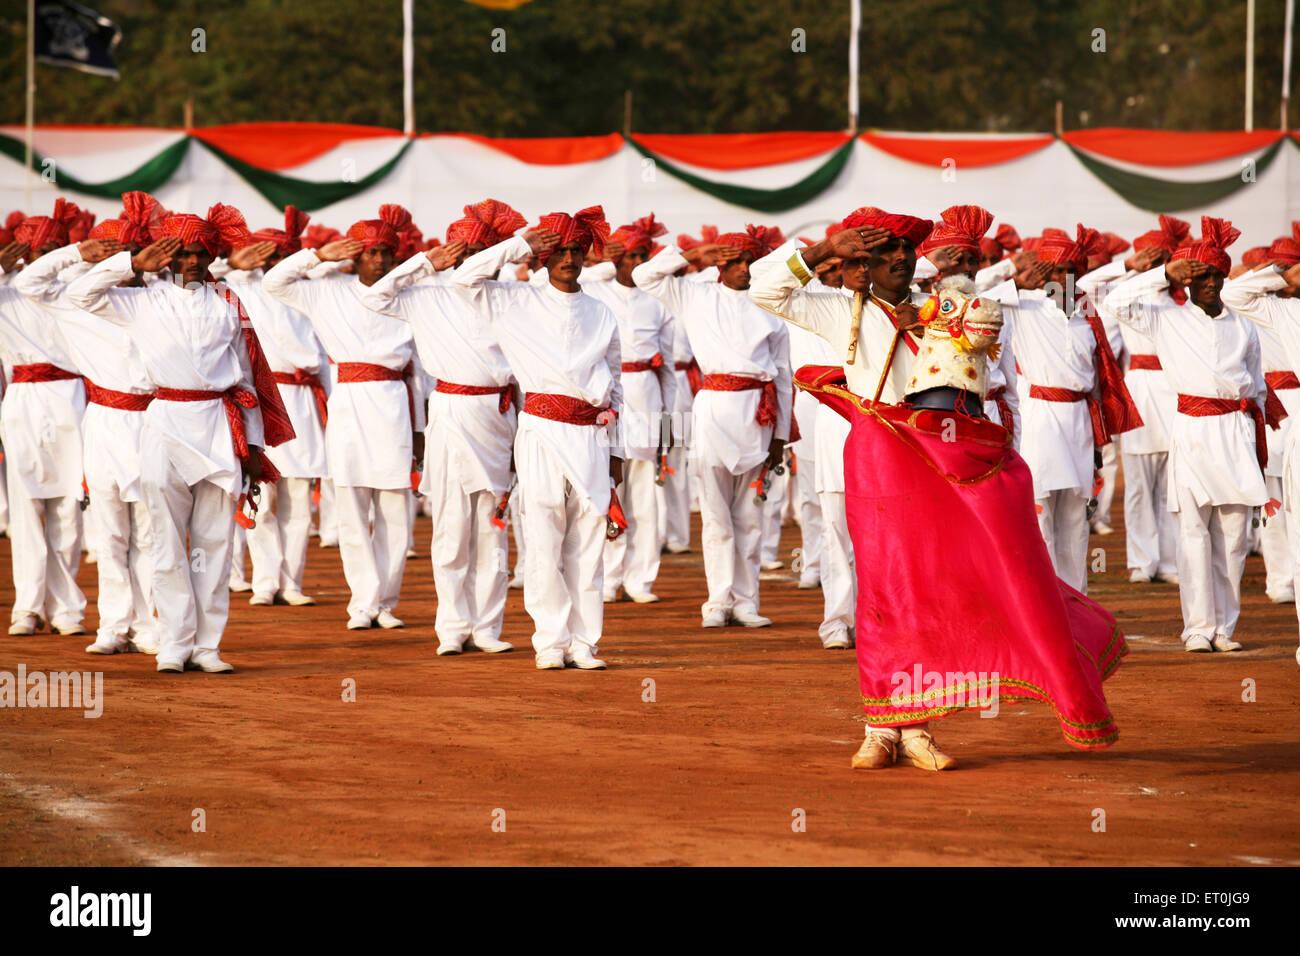 Police men traditional attire saluting performance Lejhim on 1 May Maharashtra foundation day ; Shivaji park ; Dadar - Stock Image